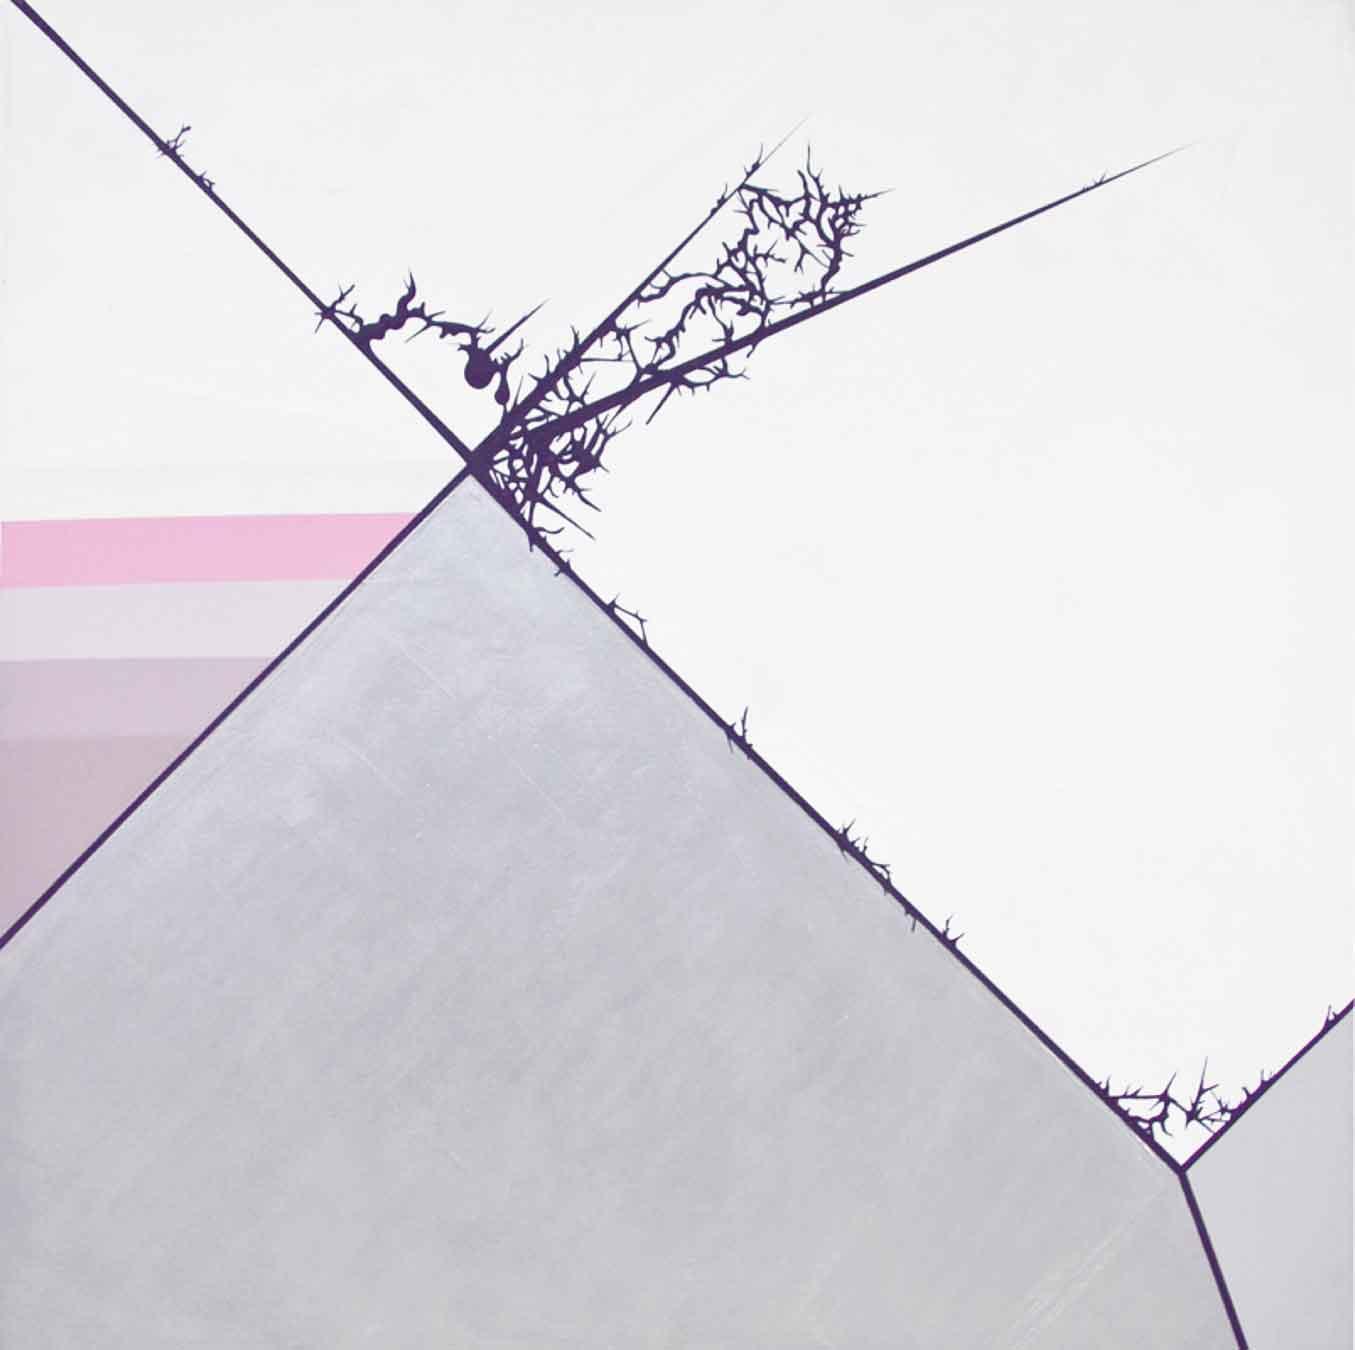 "Julie Davidow, Diagram #27 (Falcon Origami/Sarah Morris), 2010, gesso, acrylic, latex enamel, transference pigment, chrome paint on canvas, 48""x 48."" © Julie Davidow. Photo credit: Brian Burkhardt."